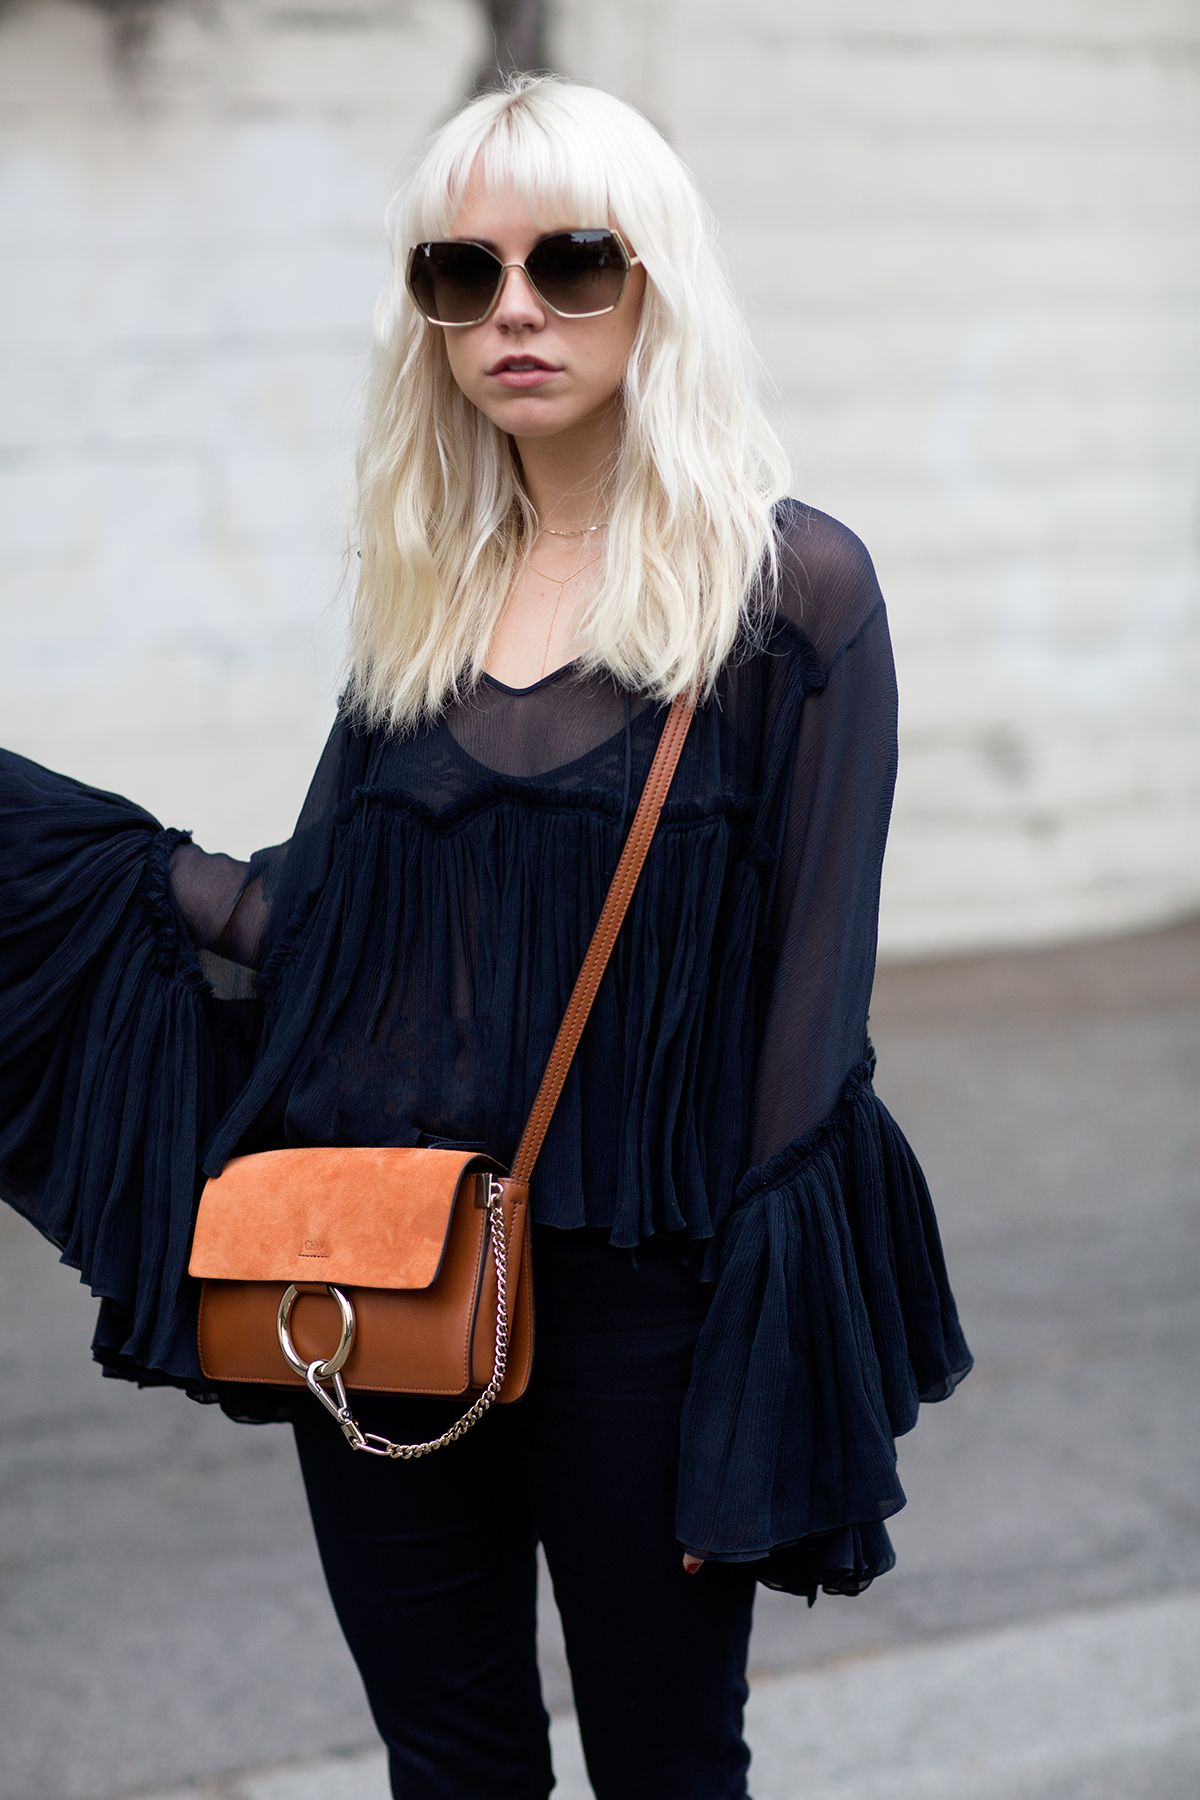 that Chloe blouse is ah-mazing. Courtney in LA. #AlwaysJudging